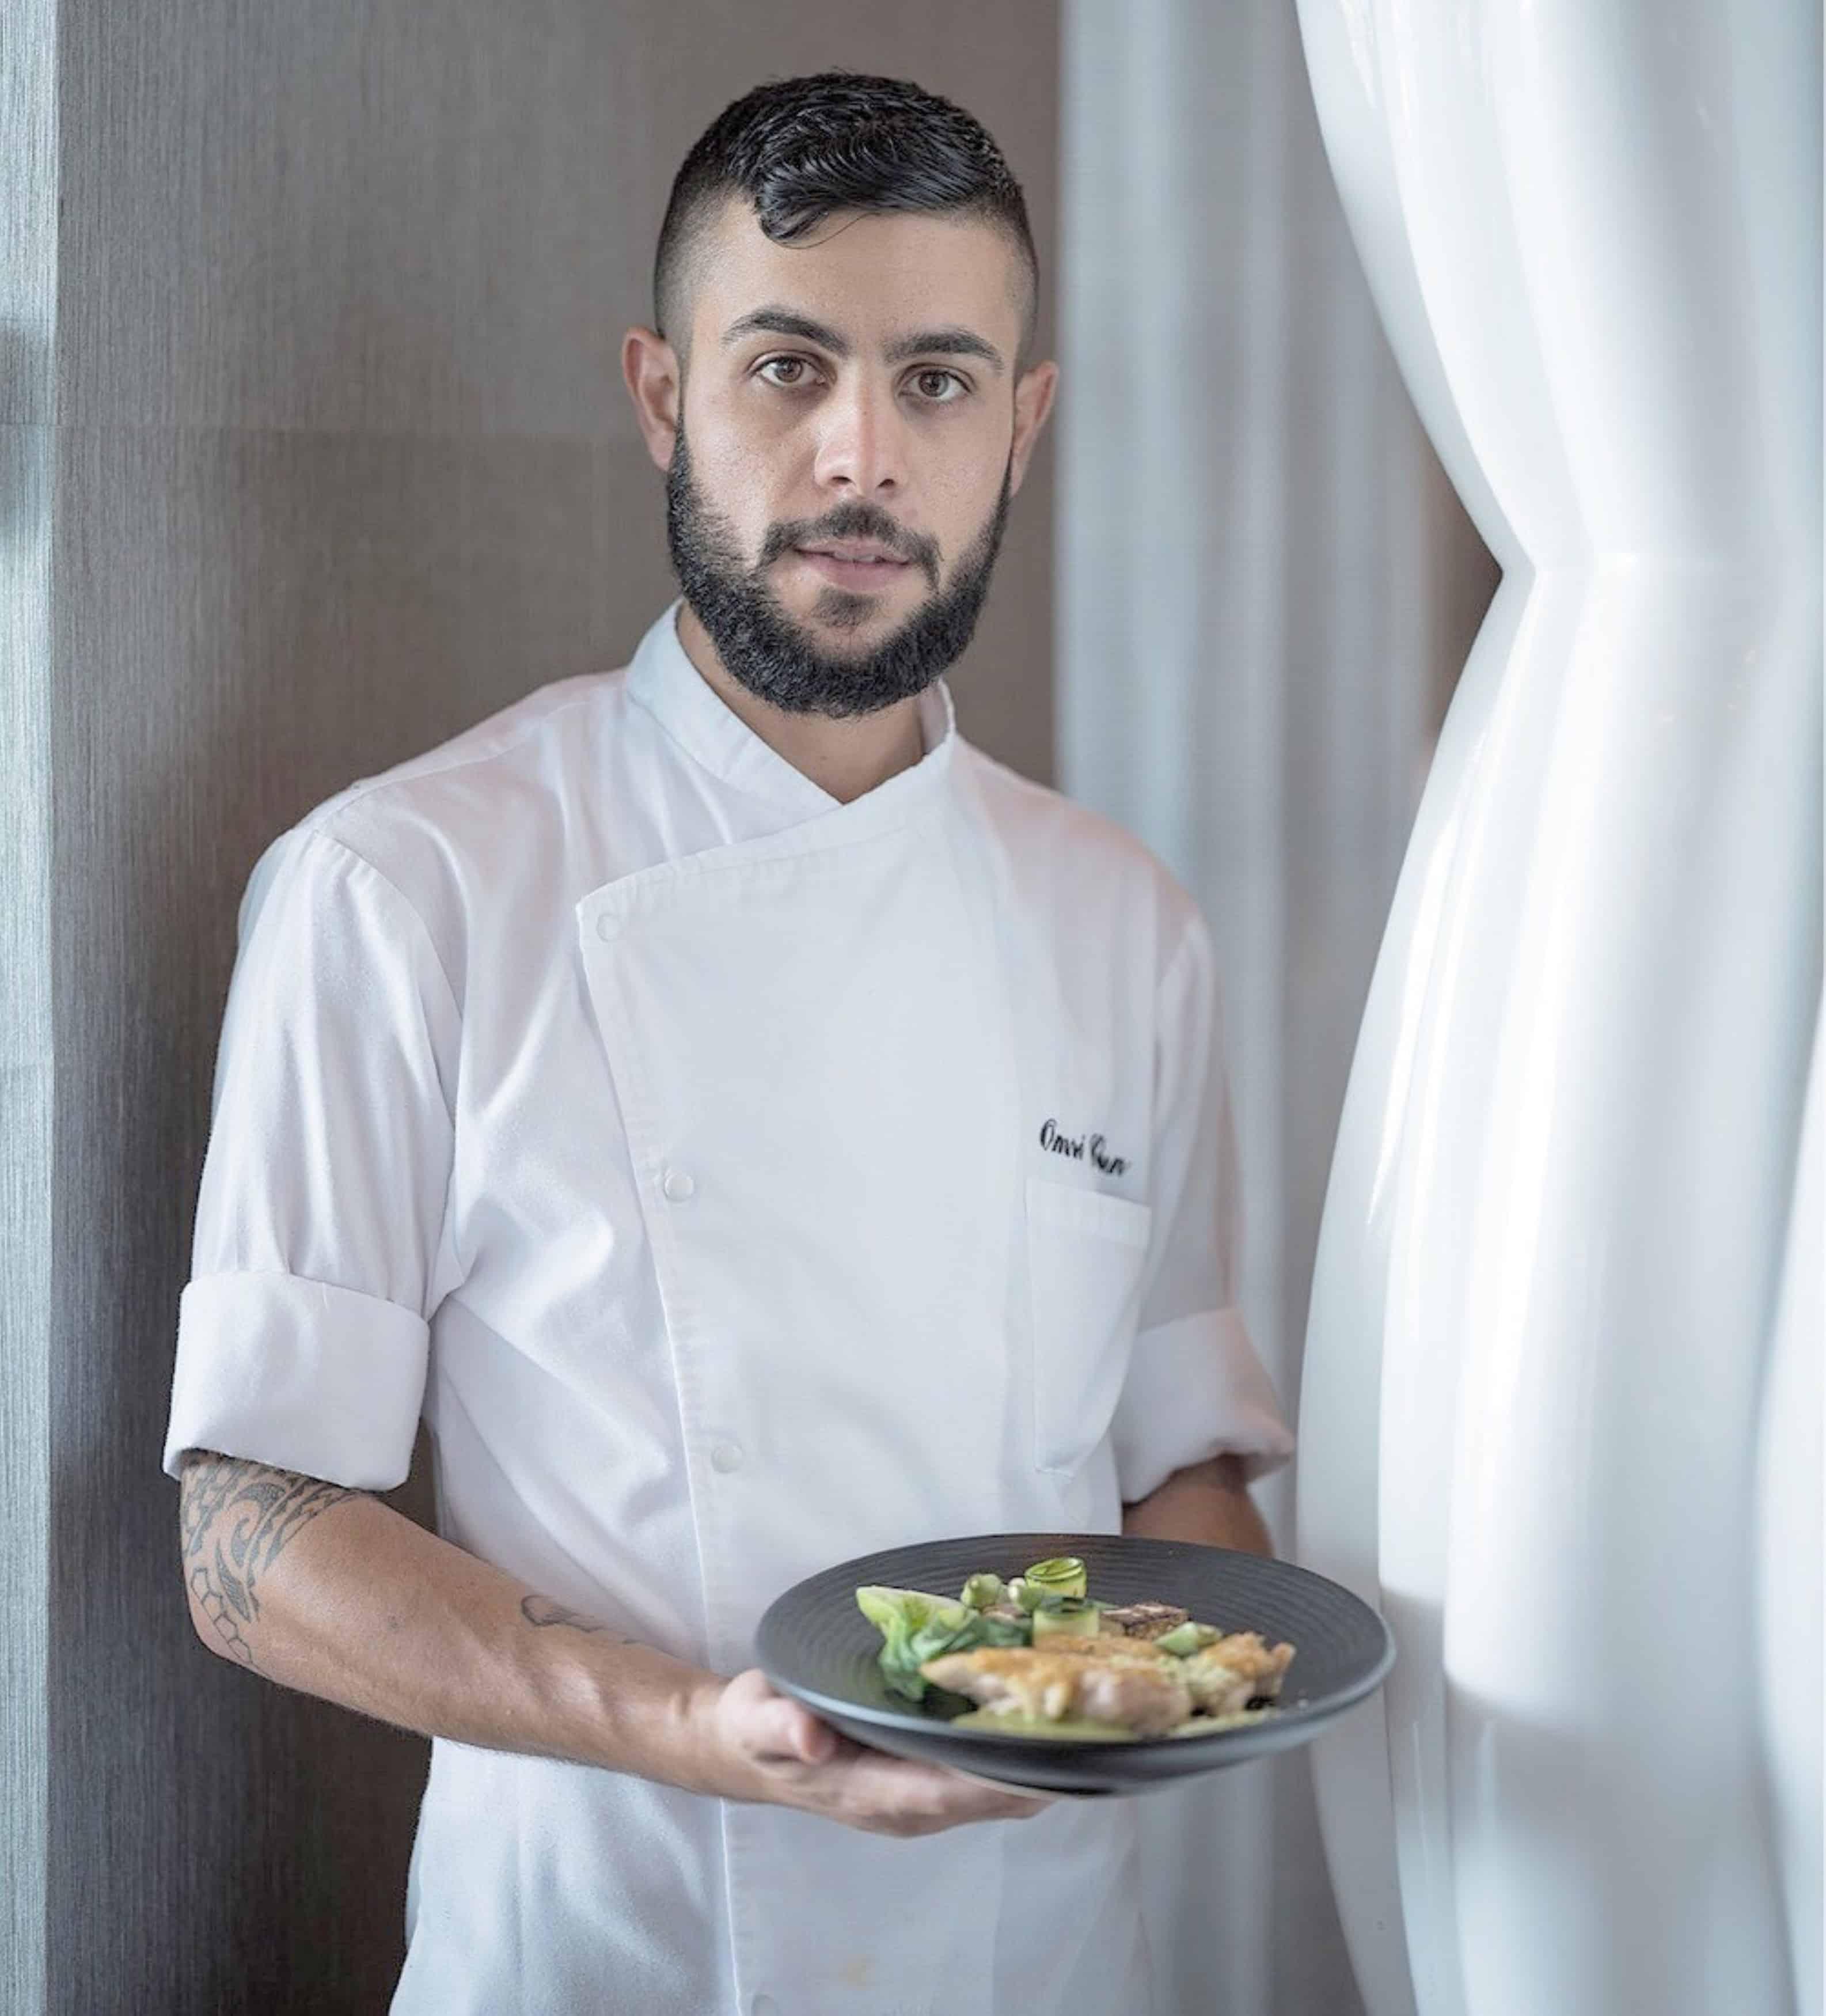 שף עומרי כהן. צילום - אנטולי מיכאלו (3)